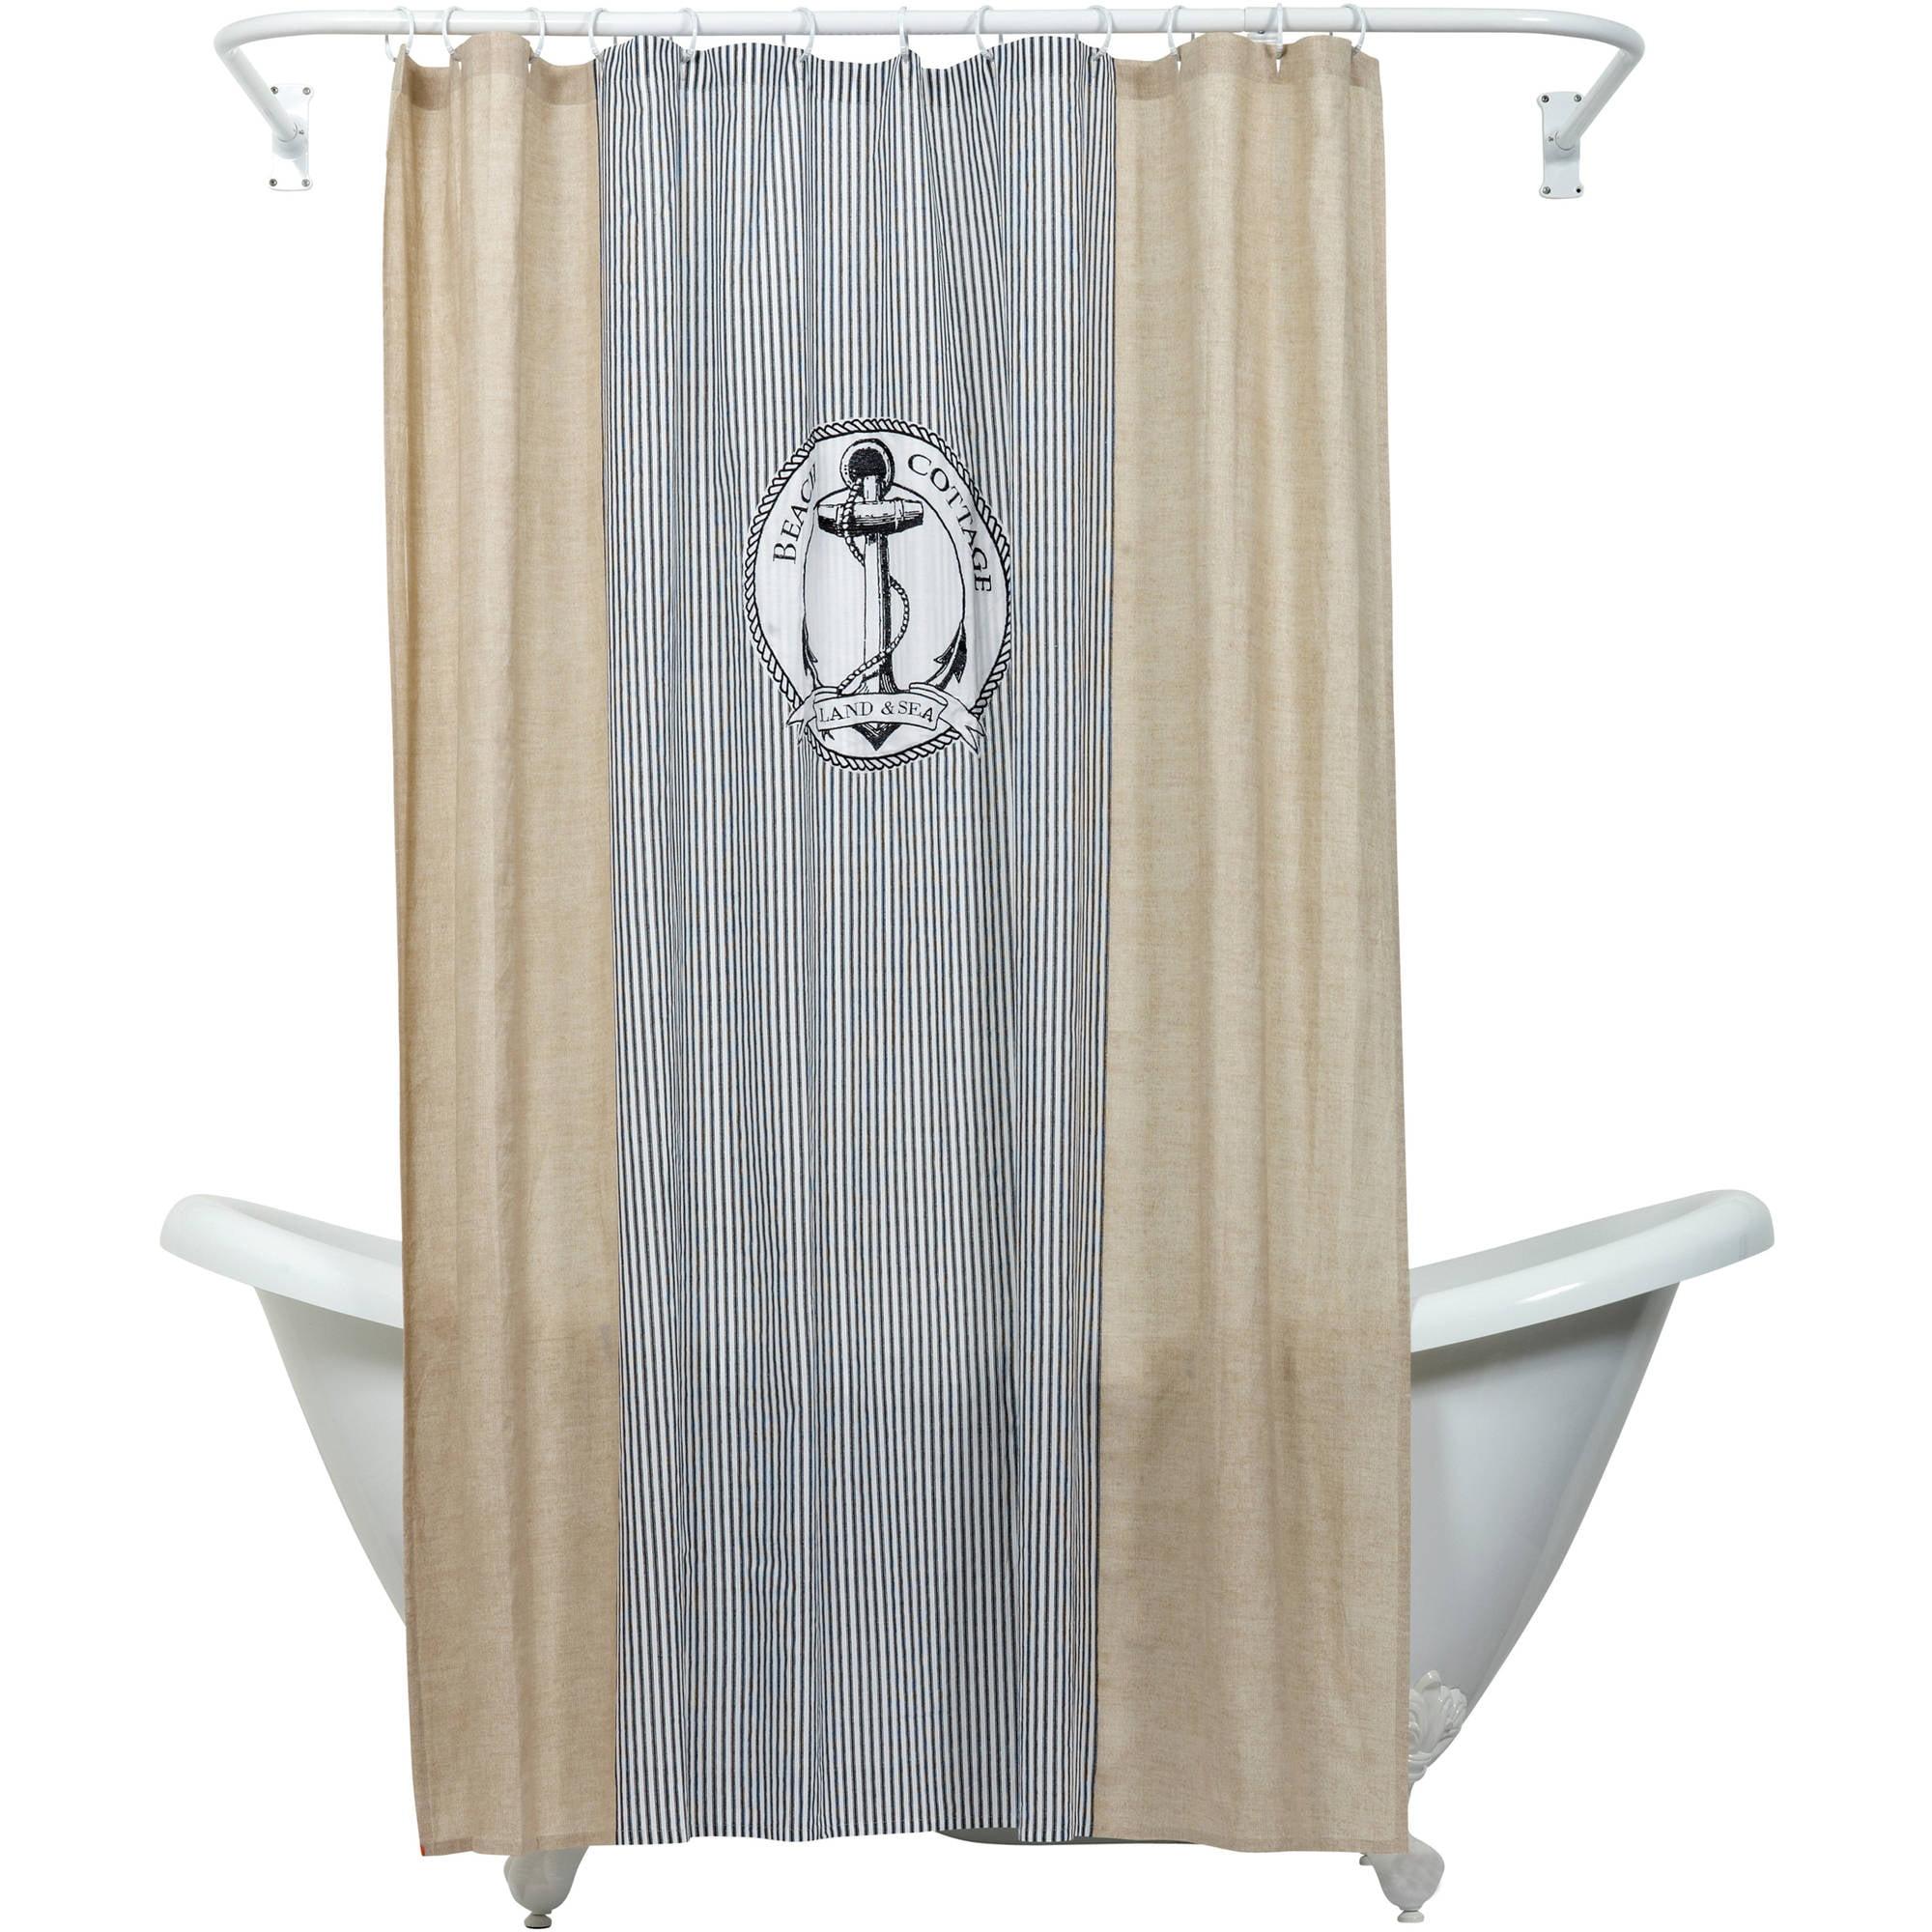 Zenna Home India Ink Beach Cottage Shower Curtain, Nautical